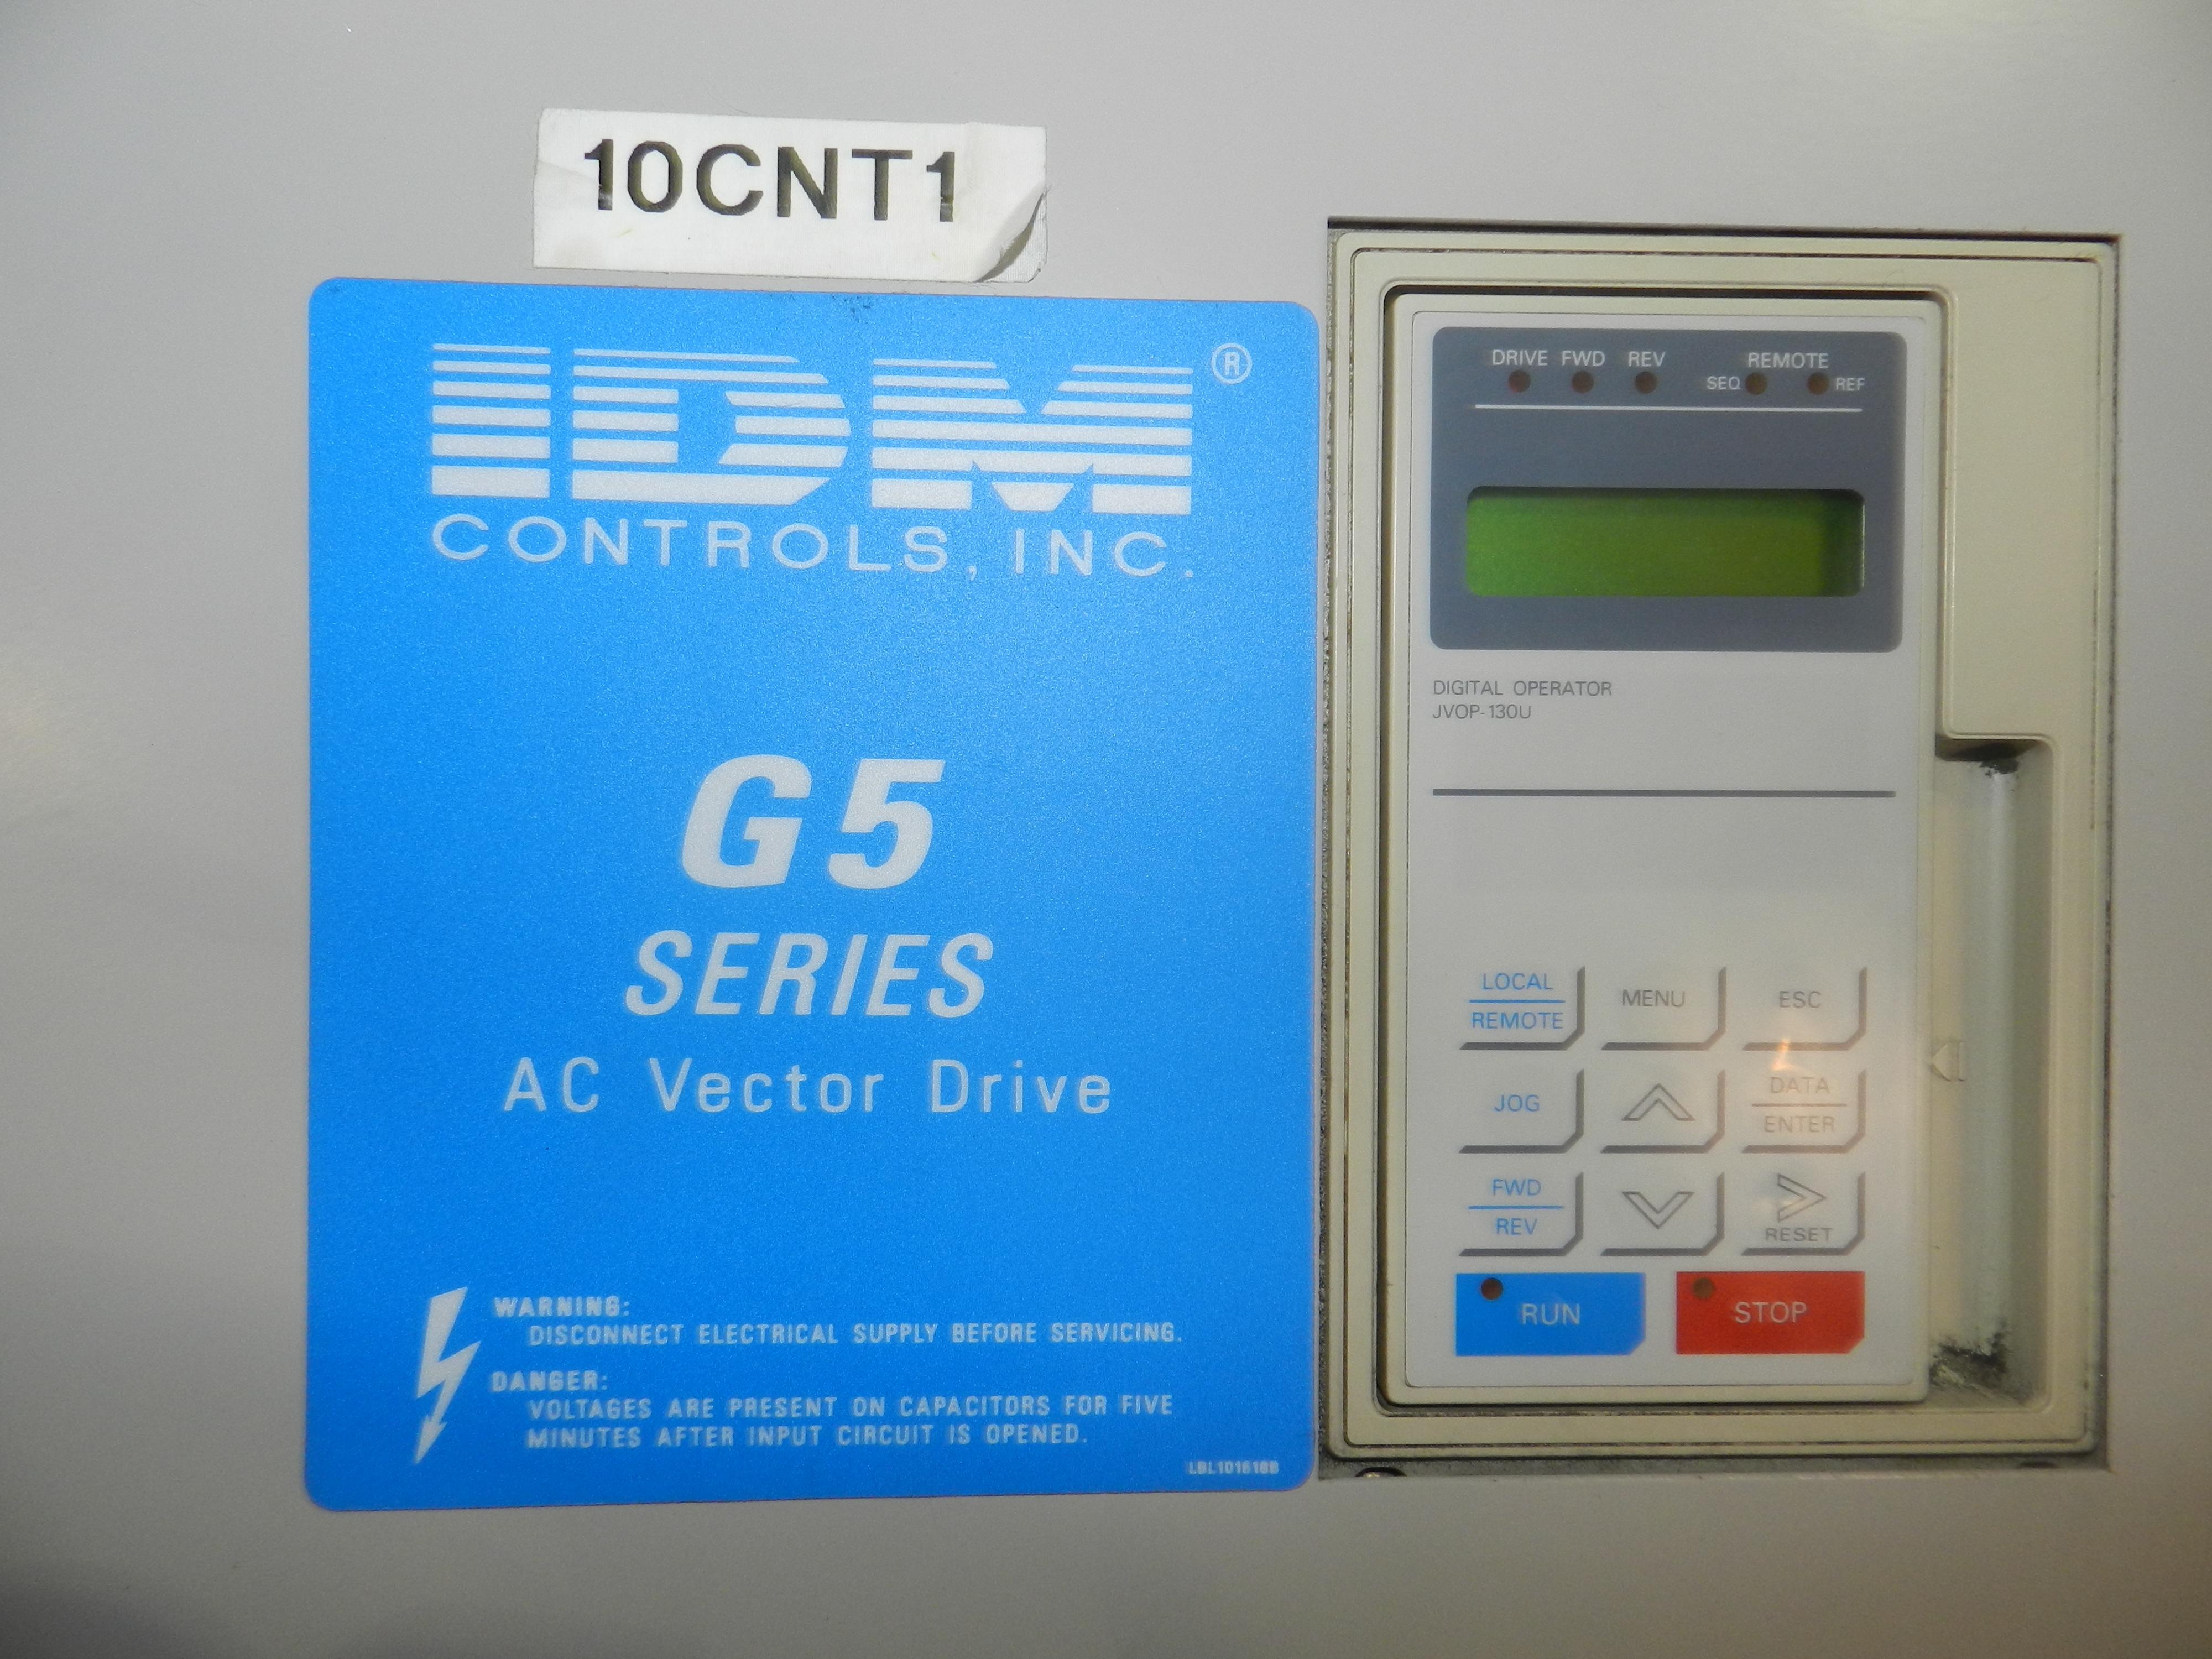 Lot 64 - IDM CIMR-G5U4018 G5 Series AC Vector Drive 46 Amp